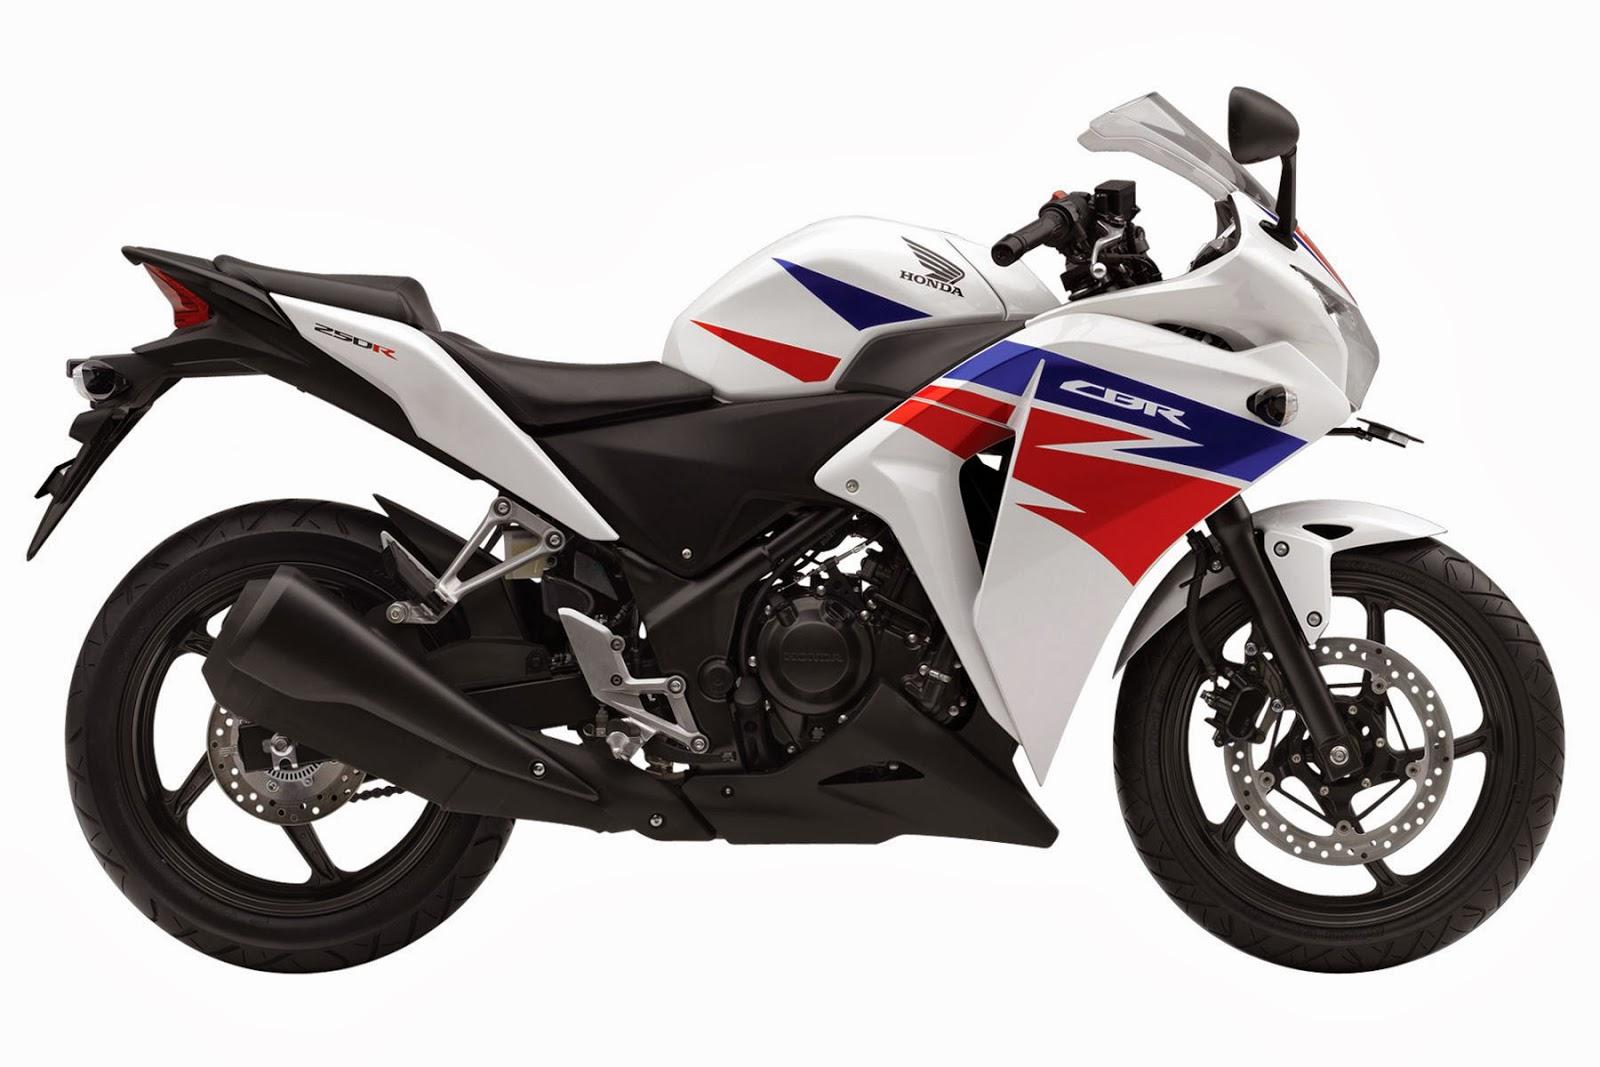 Perbandingan Yamaha Byson Vs Honda CBR 250